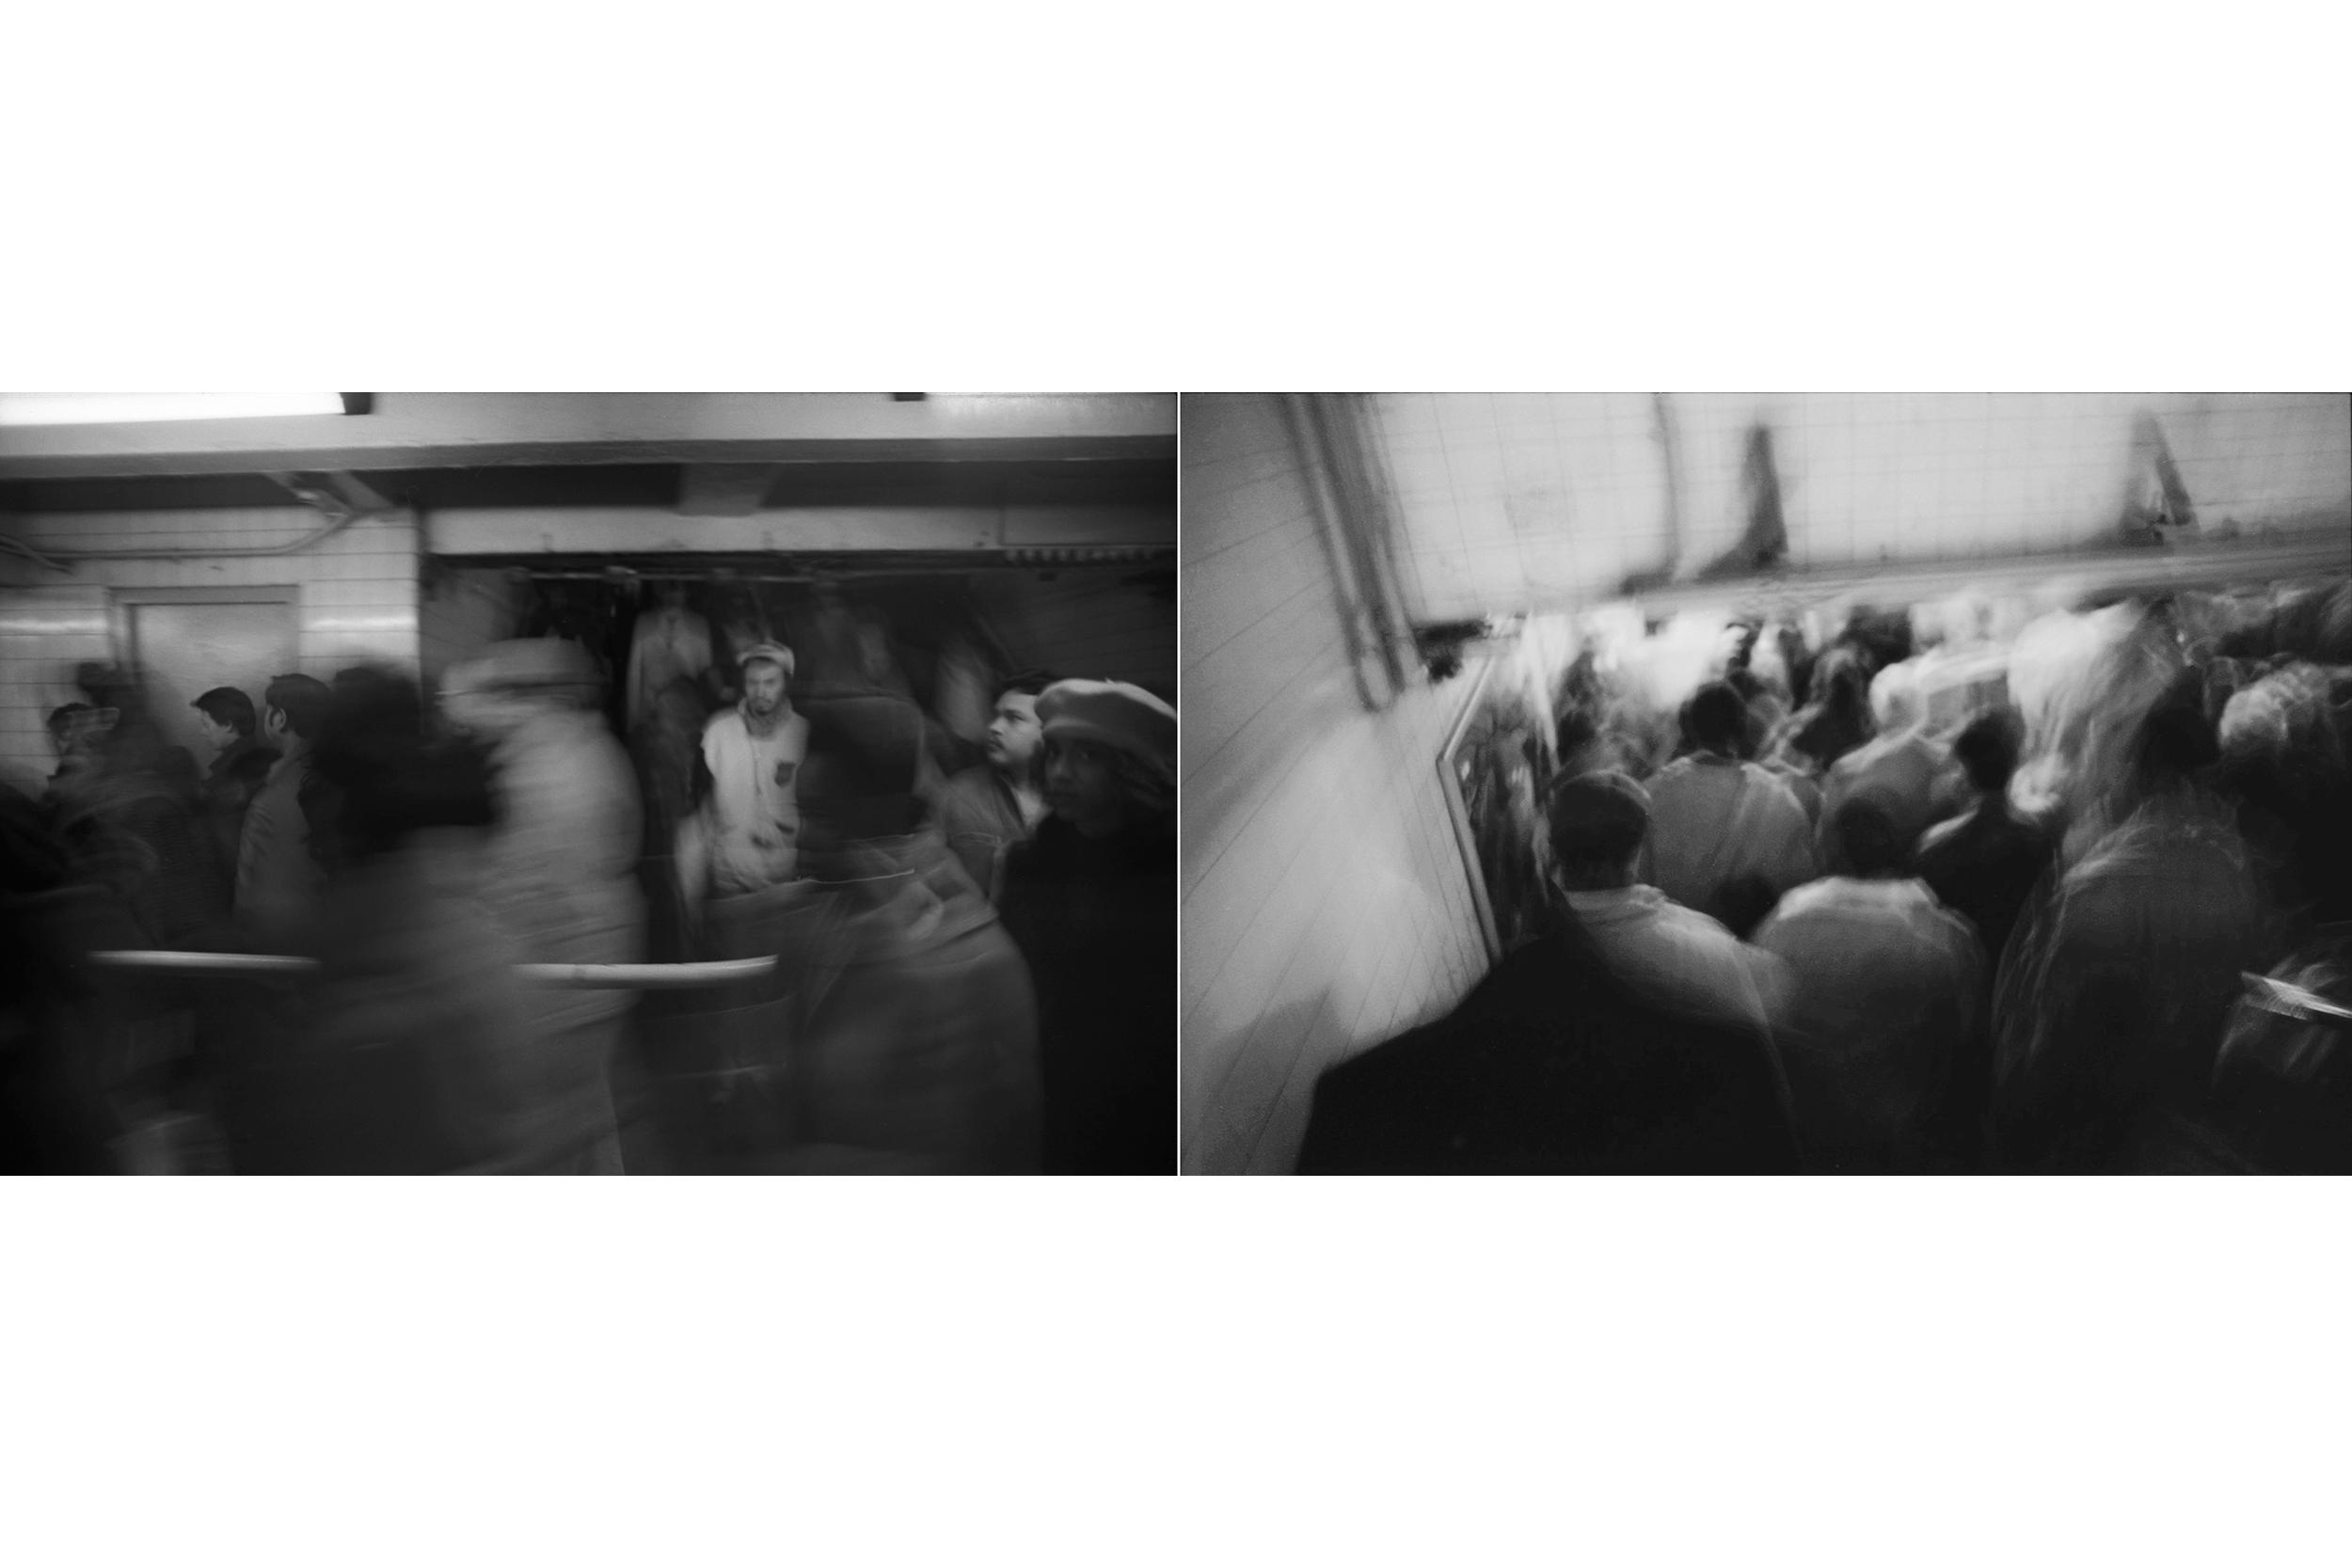 Subway, 1989